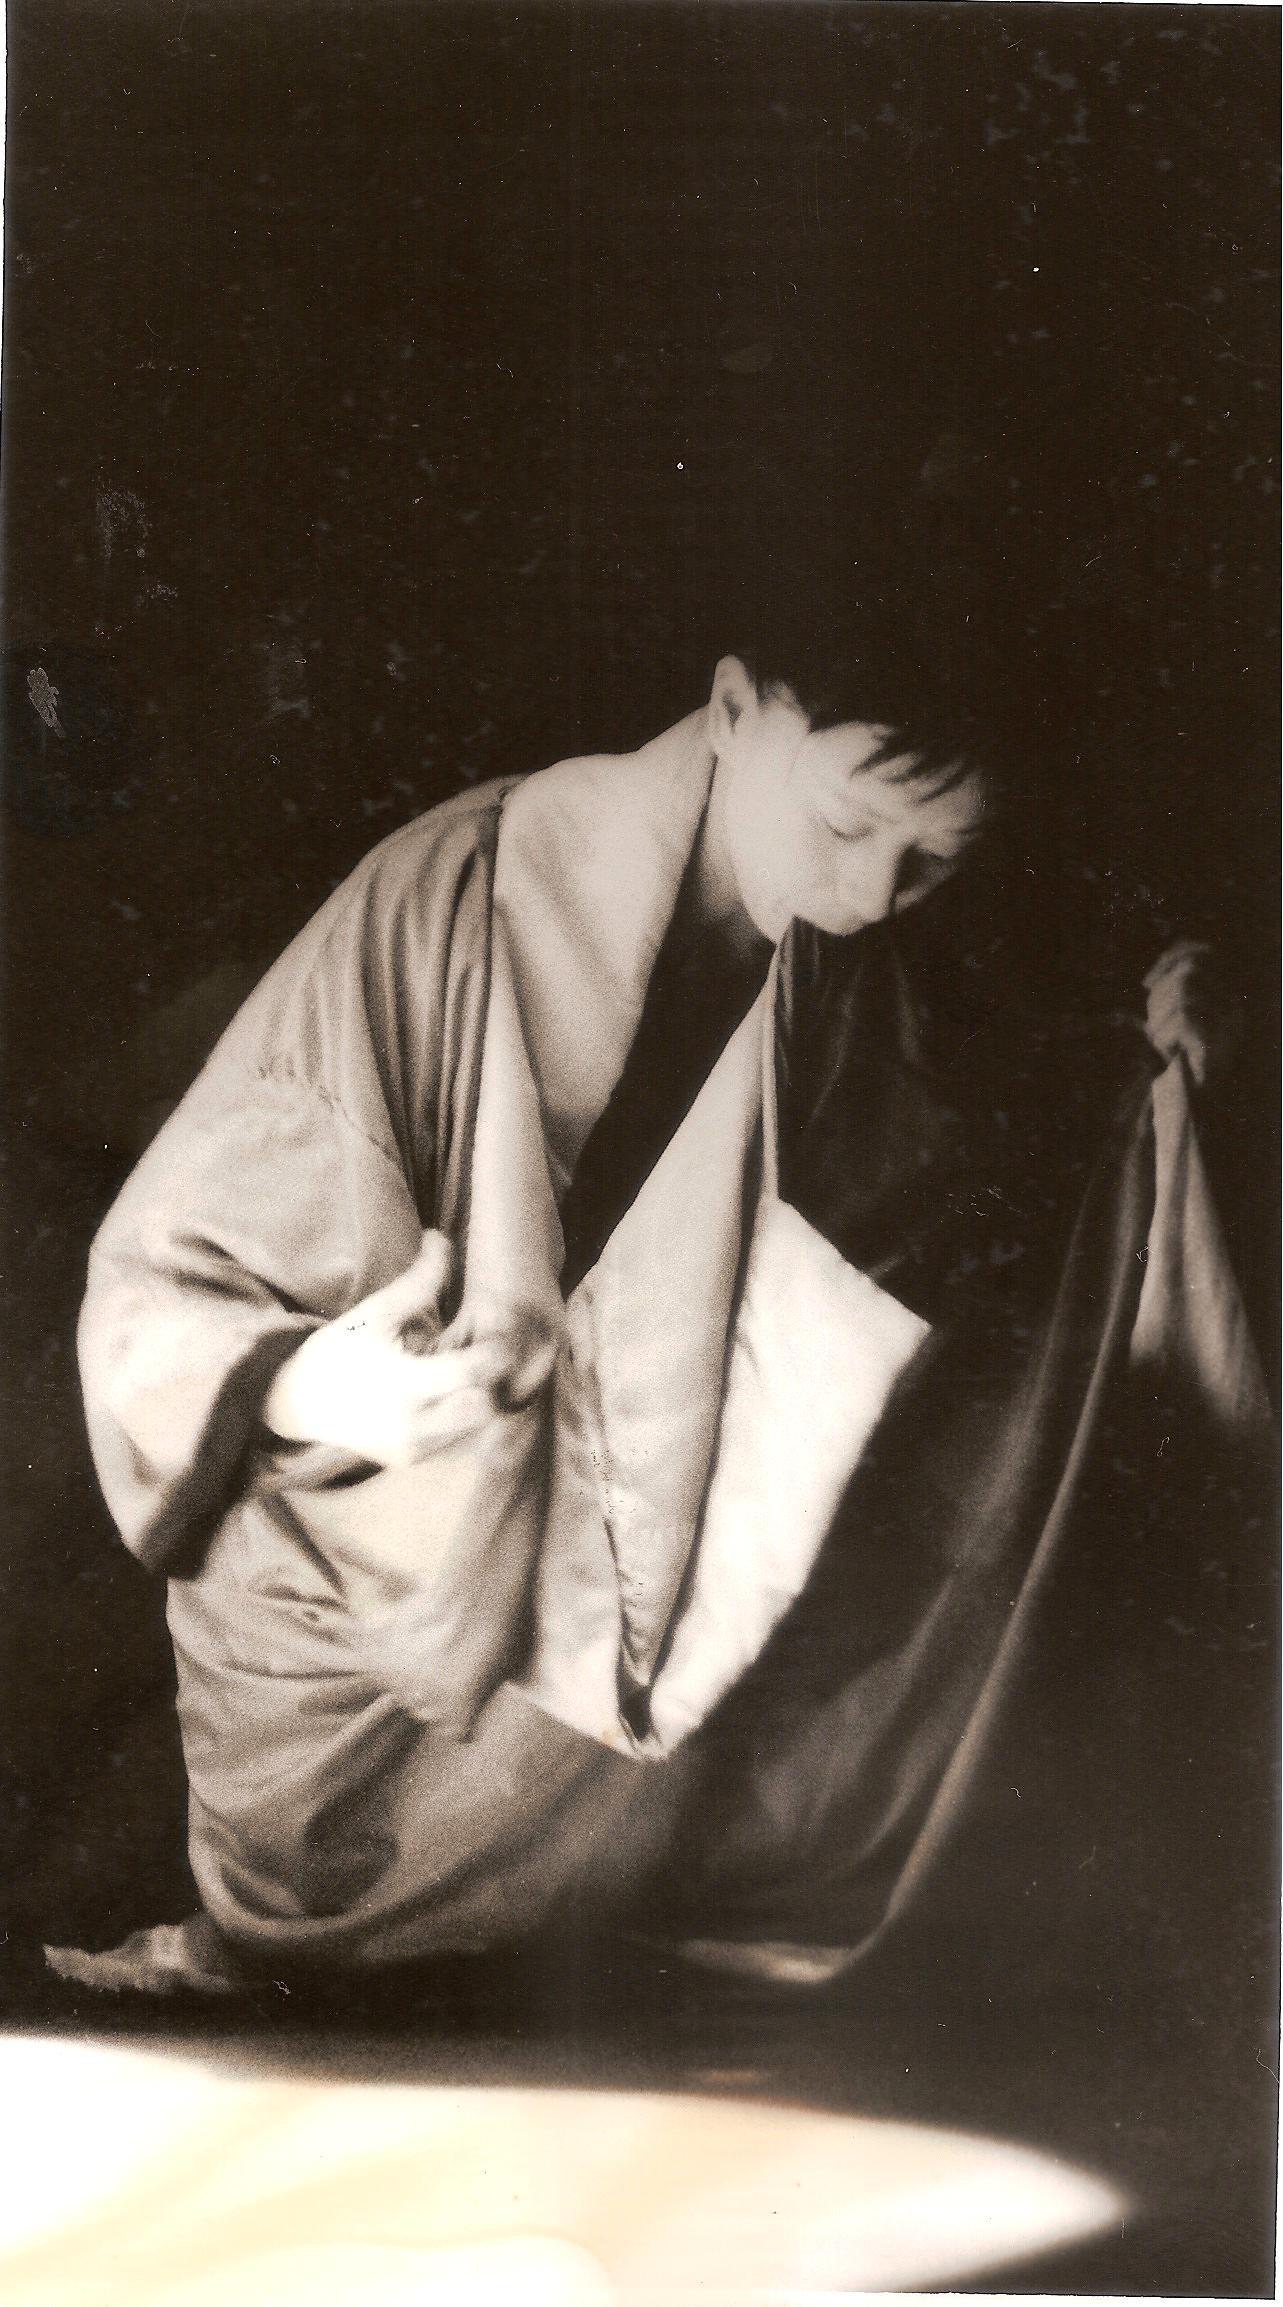 1 – Akinori Kagisako